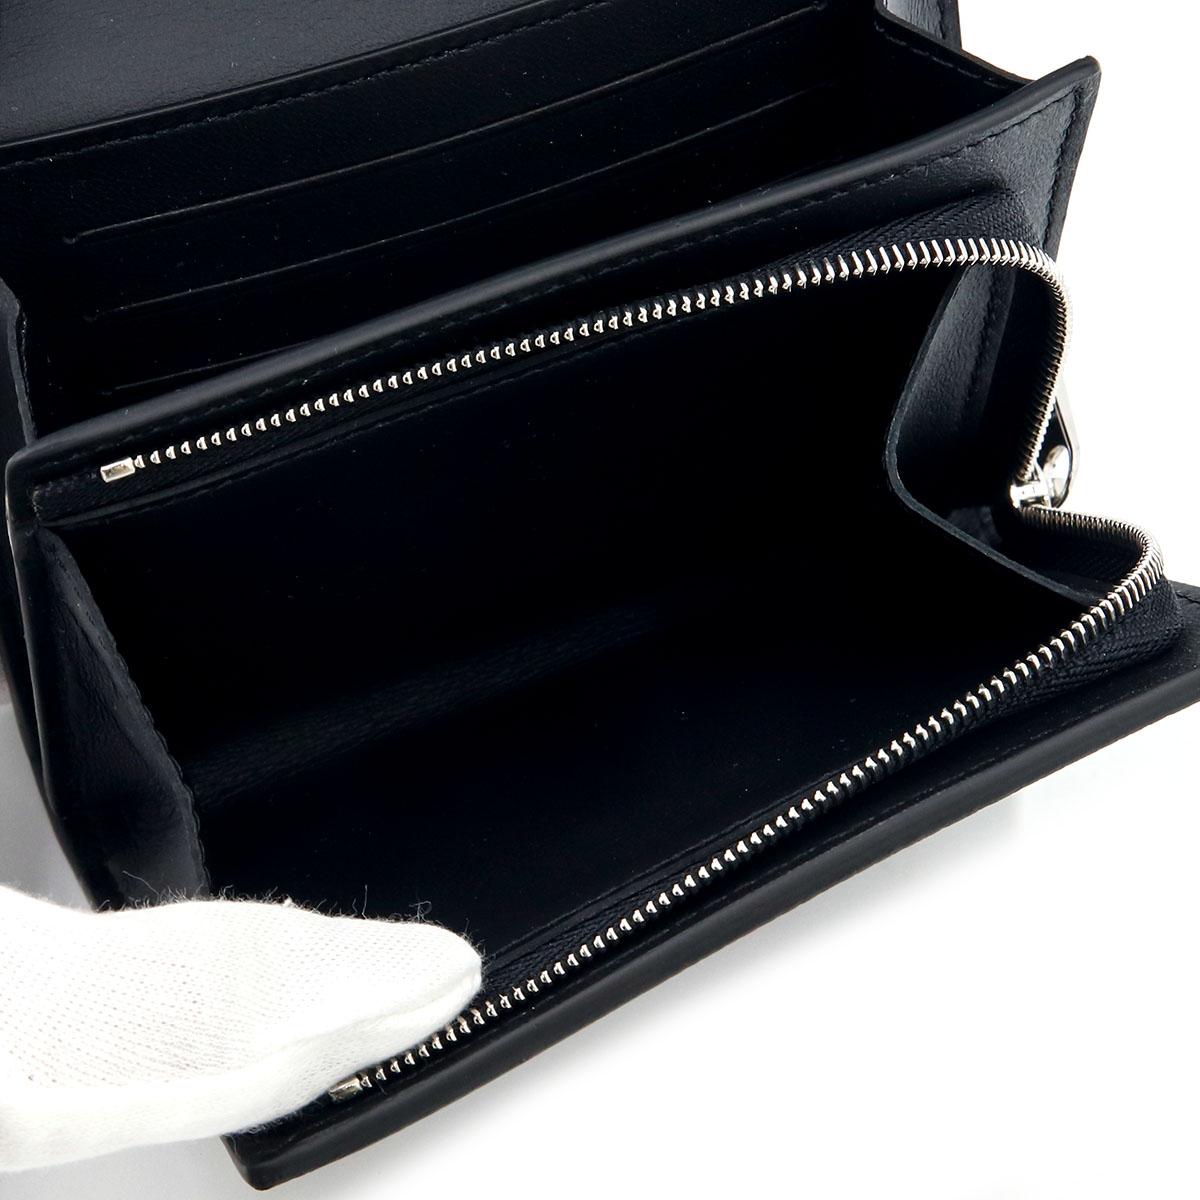 LOUIS VUITTON ルイヴィトン ヴィトン ブイトン ビトン 財布 ミニ財布 ちび財布 折財布 三つ折り財布 ポルトフォイユ イリス コンパクト M62540 ウォレット 新品 正規品 高級 ブランド 2020年 ギフト 新生活 プレゼントHYI2WE9D